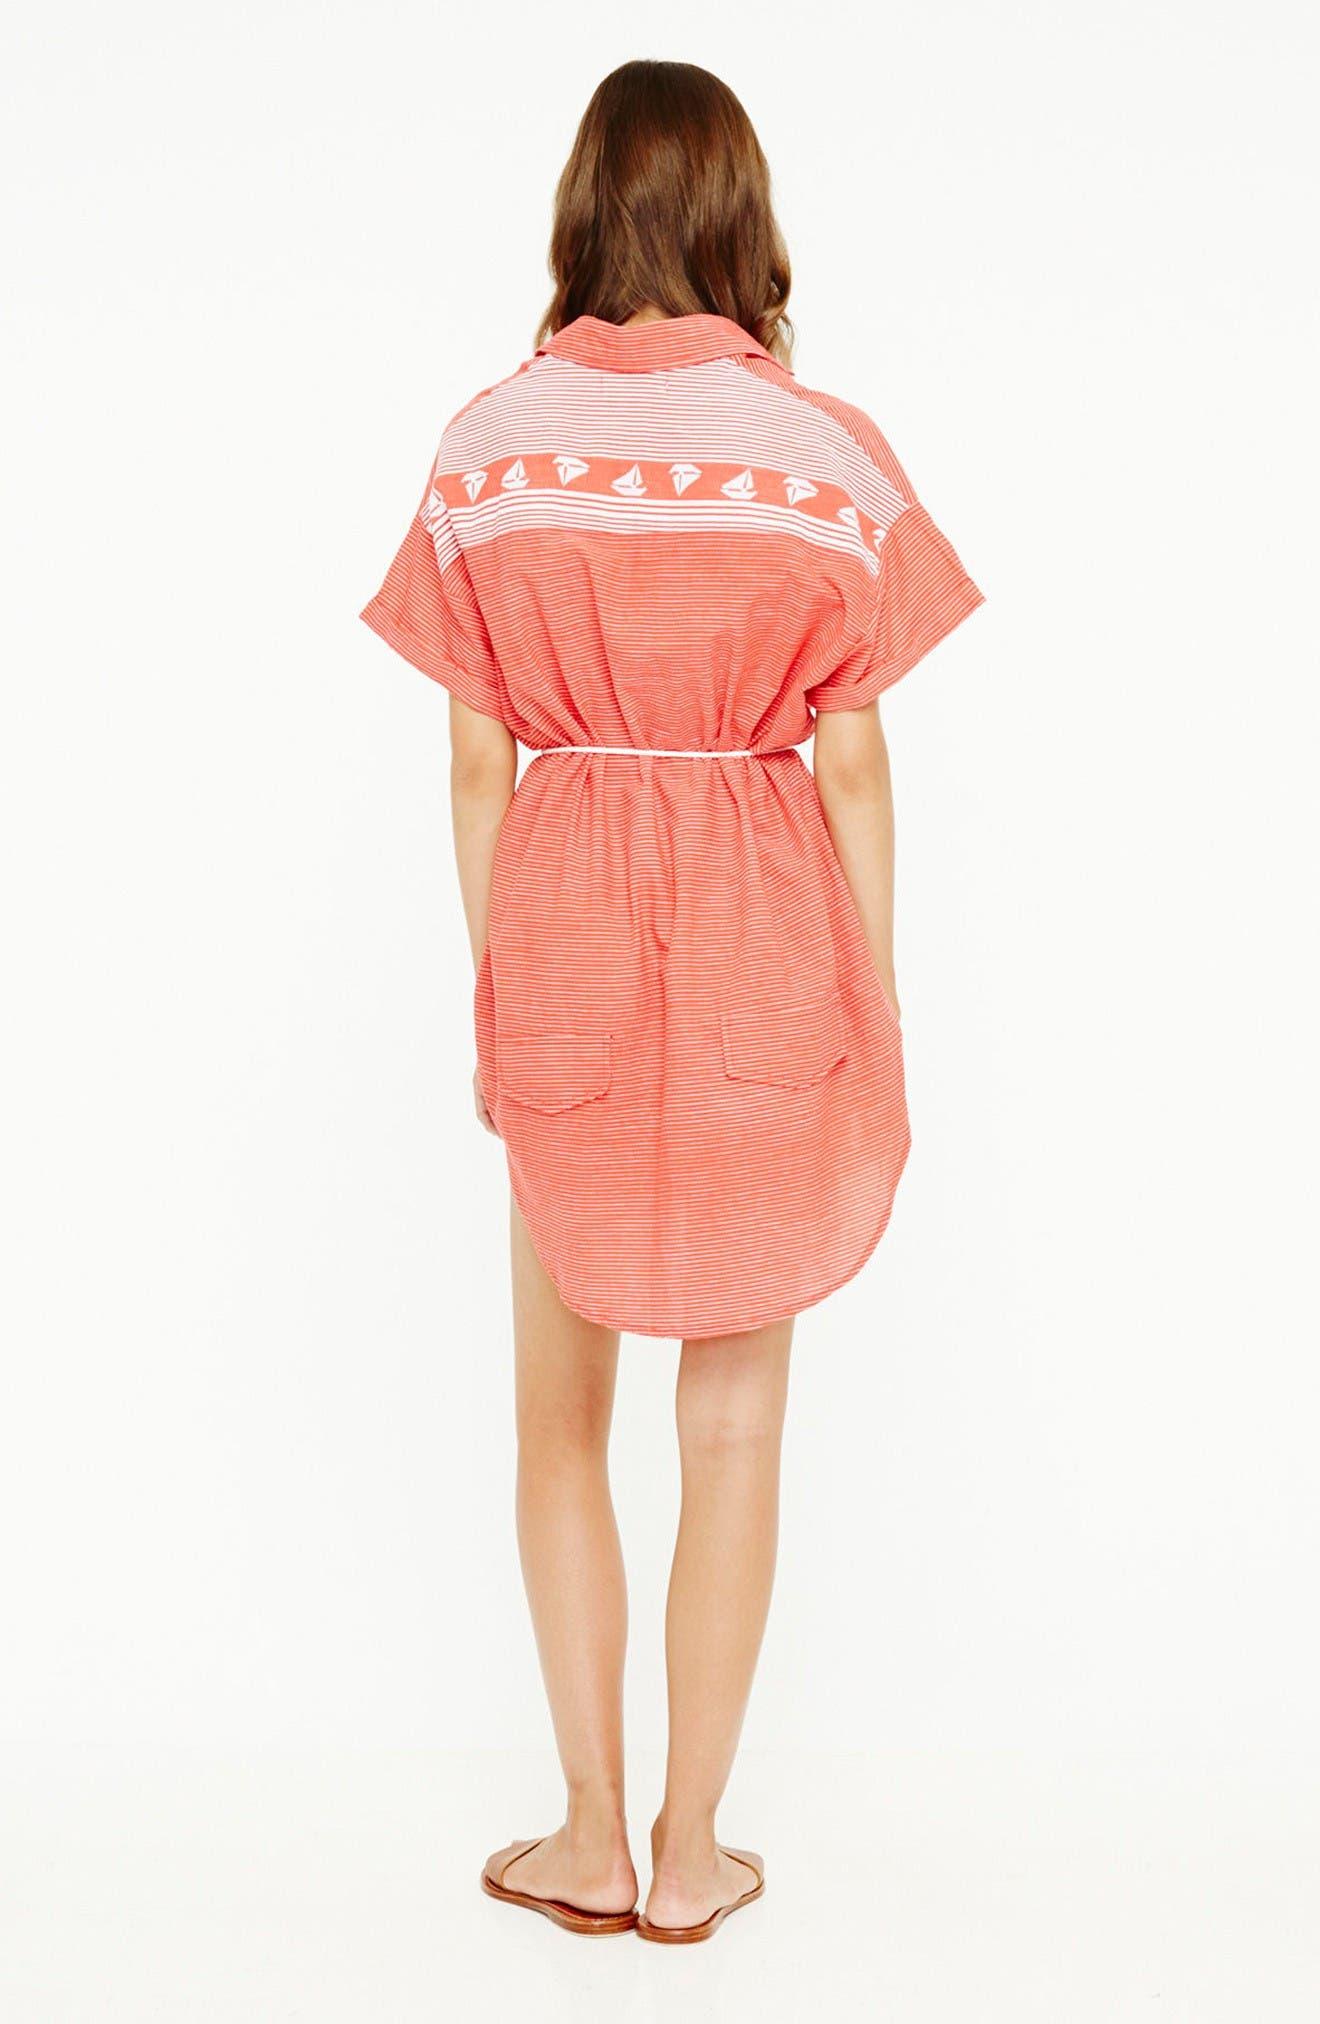 Avalon Cotton Shirtdress,                             Alternate thumbnail 7, color,                             Deep Sea Print Red